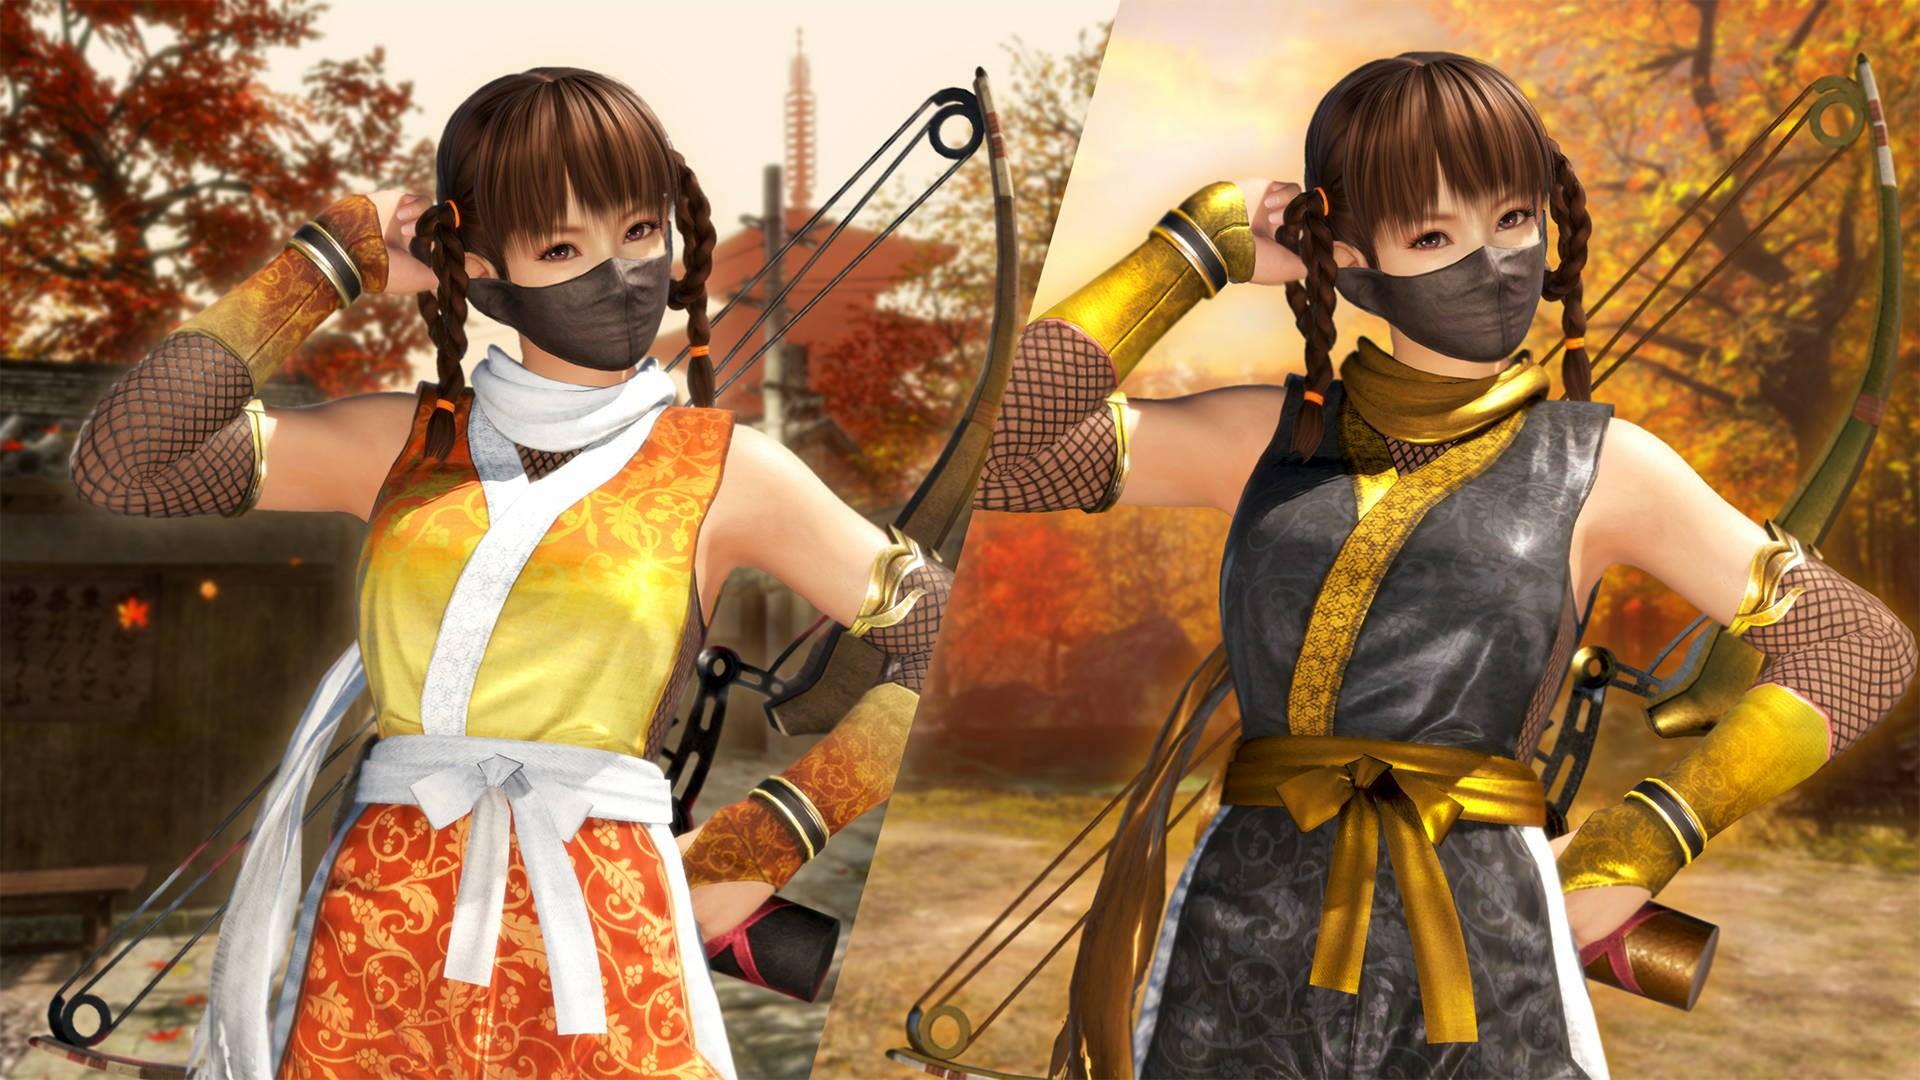 Tenue de Ninja métamorph DOA6 - Leifang